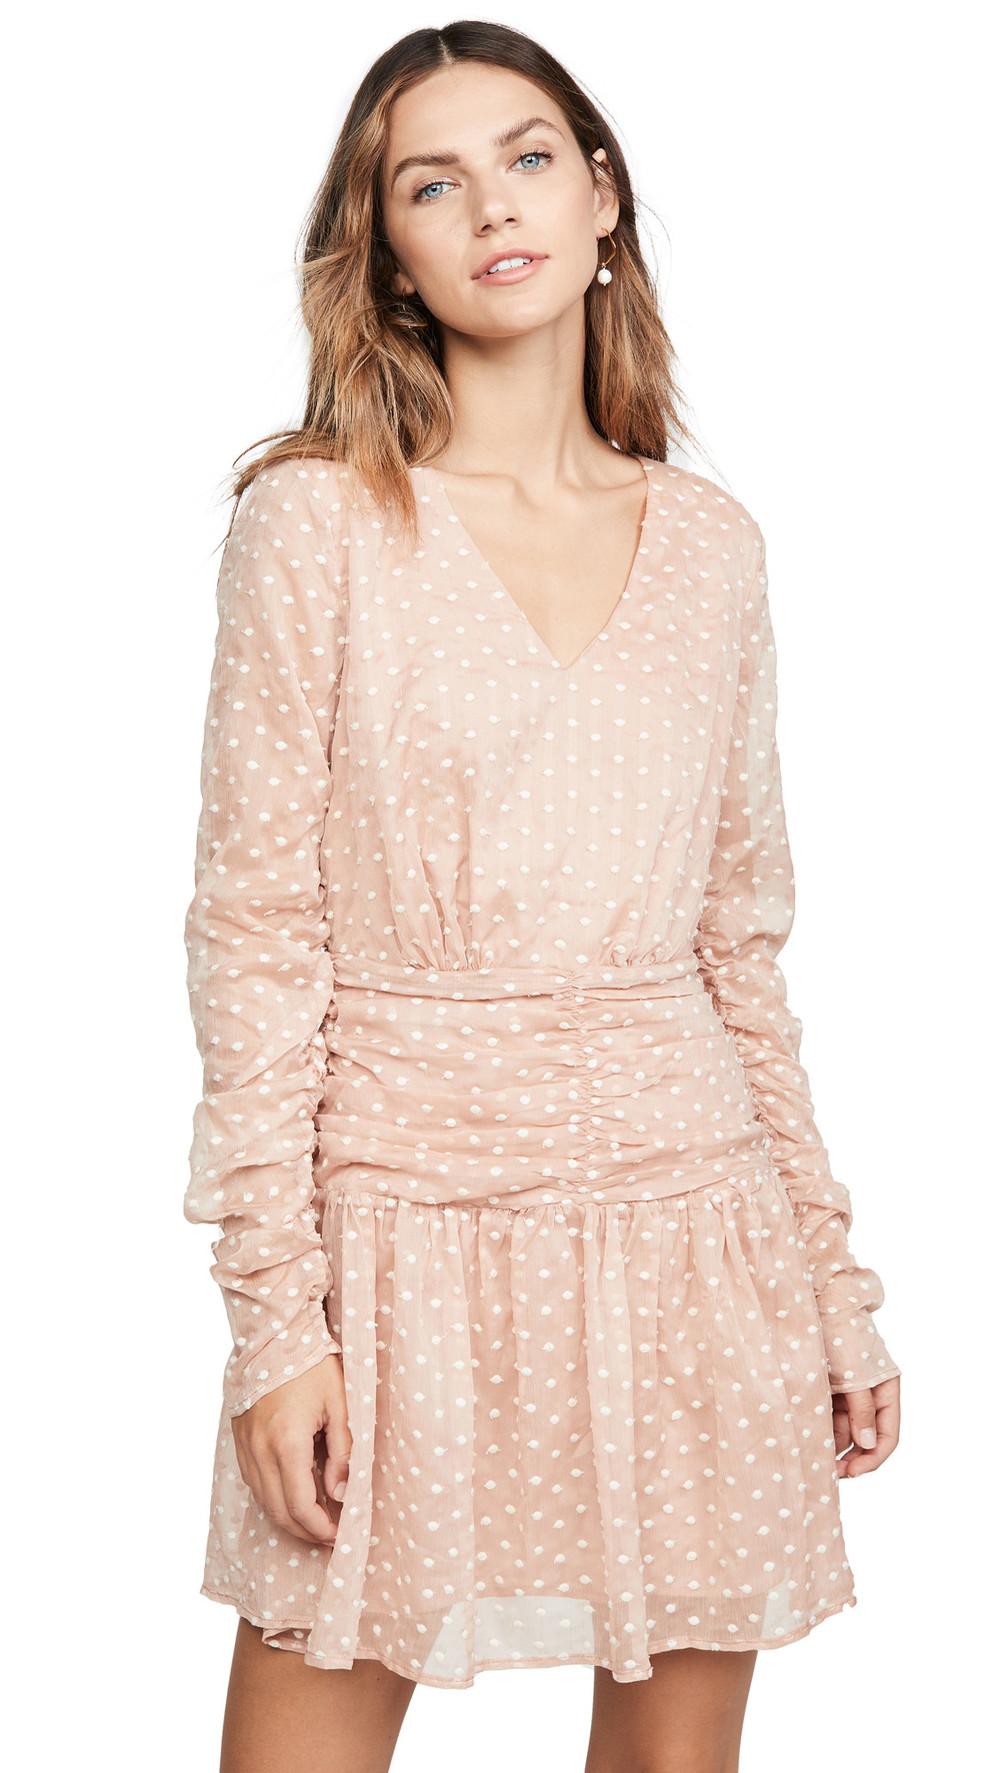 endless rose Polka Dot Mini Dress in pink